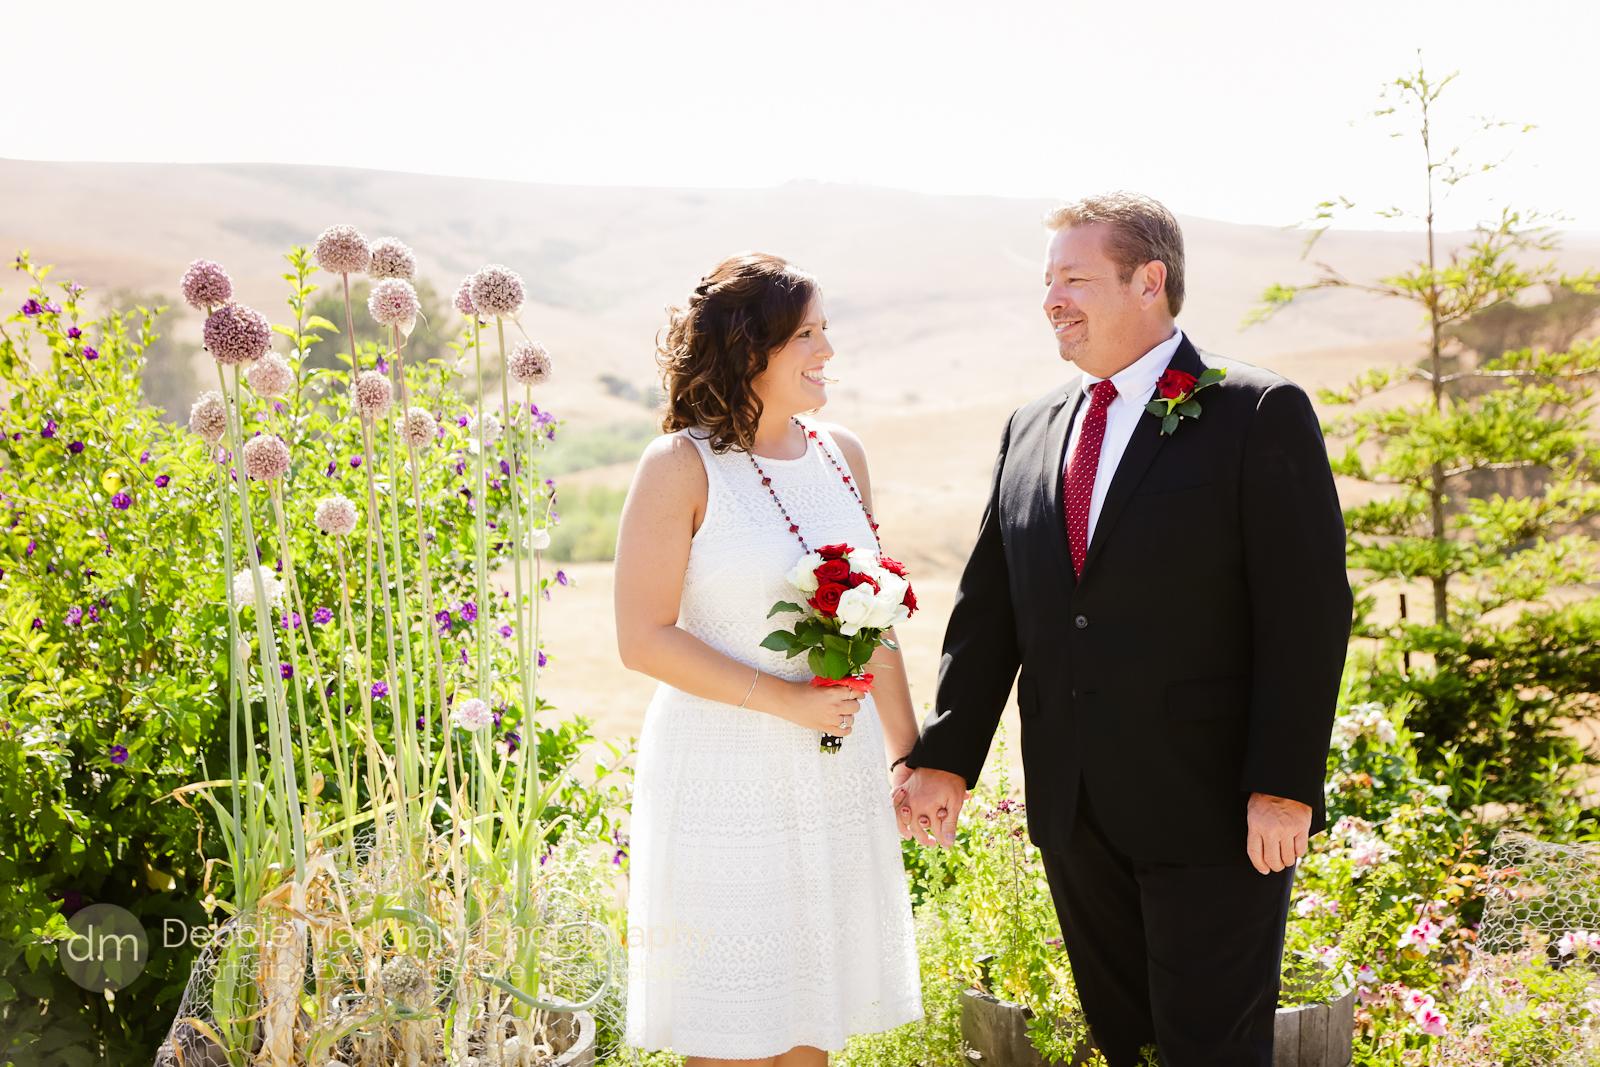 Debbie-Markham-Photography_Small-Town-Wedding_Destination-Wedding_California_Central-Coast-1777.jpg